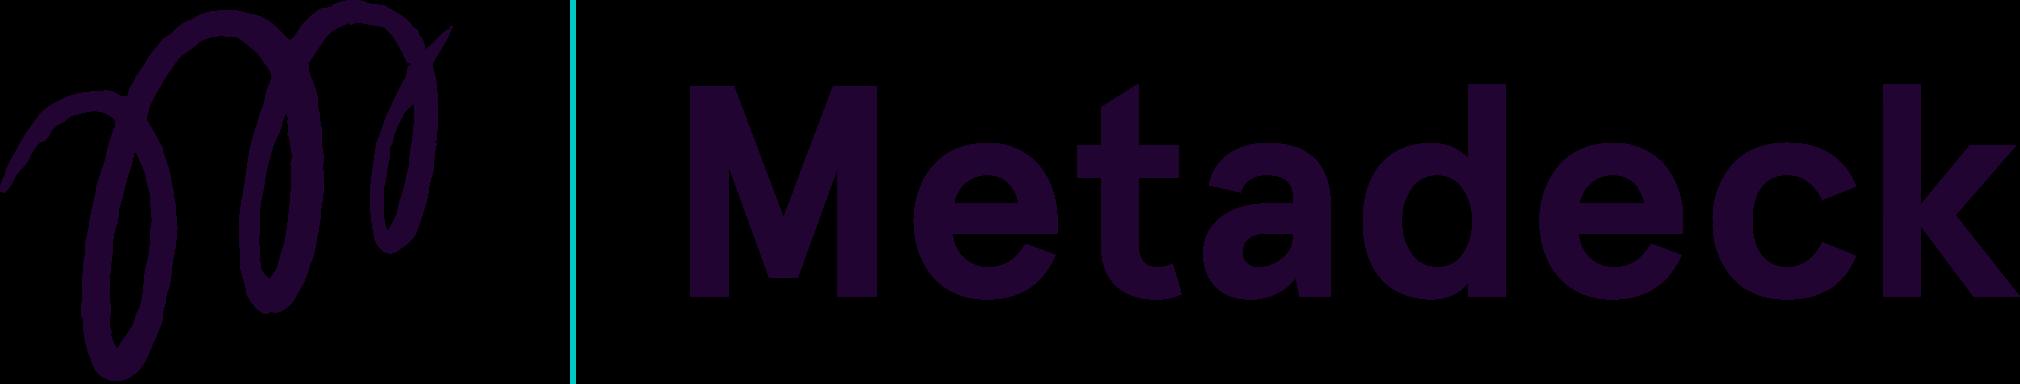 Metadeck